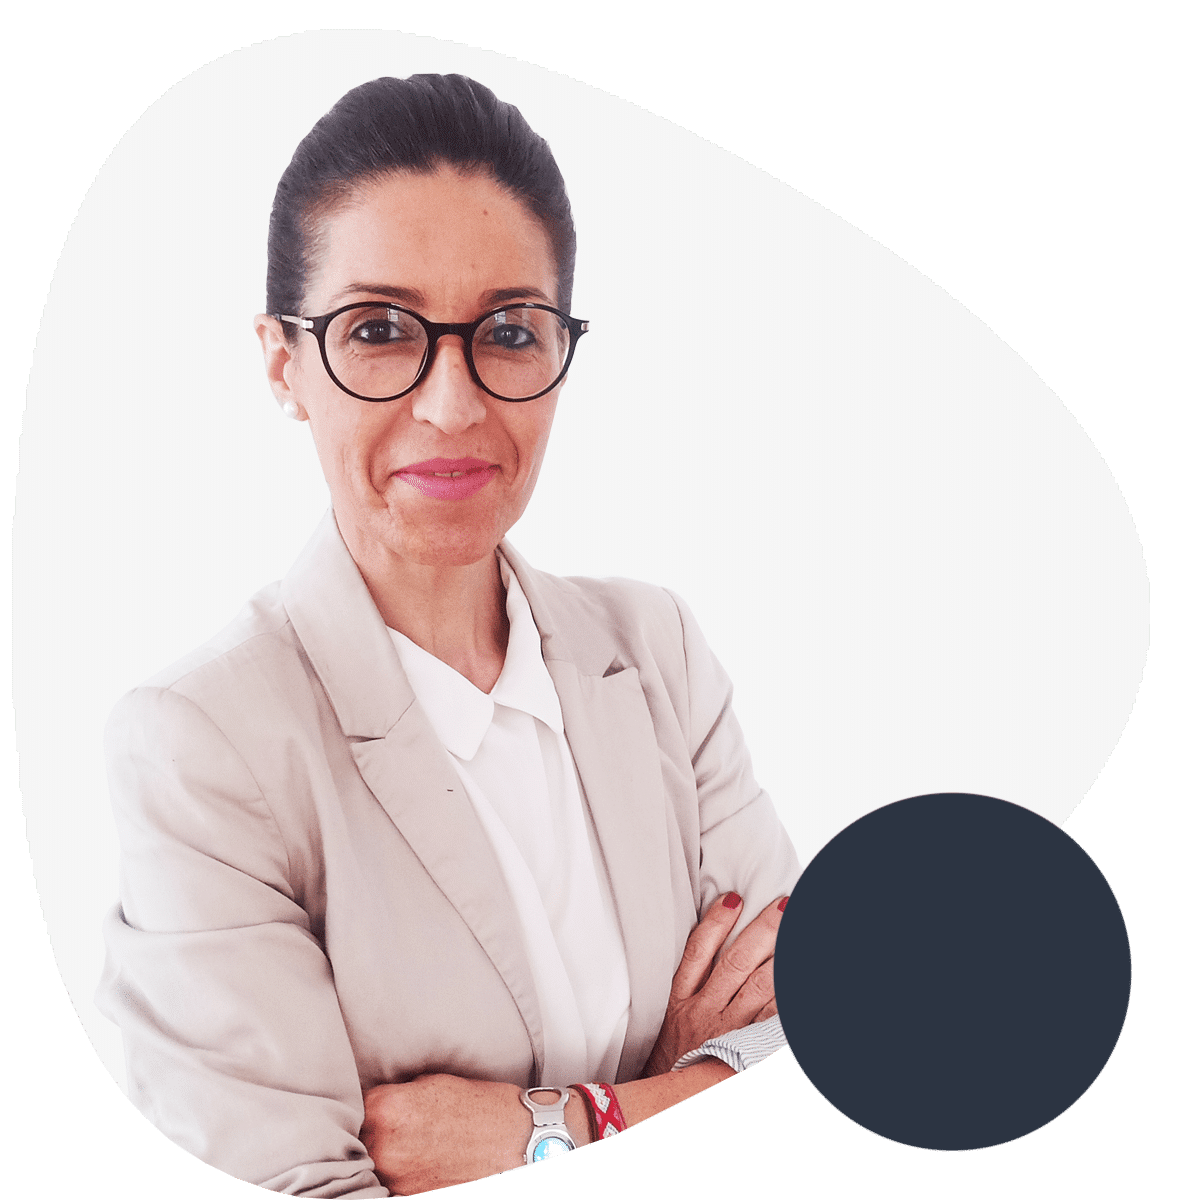 https://takeatip.es/wp-content/uploads/2021/09/Blanca_murube.png